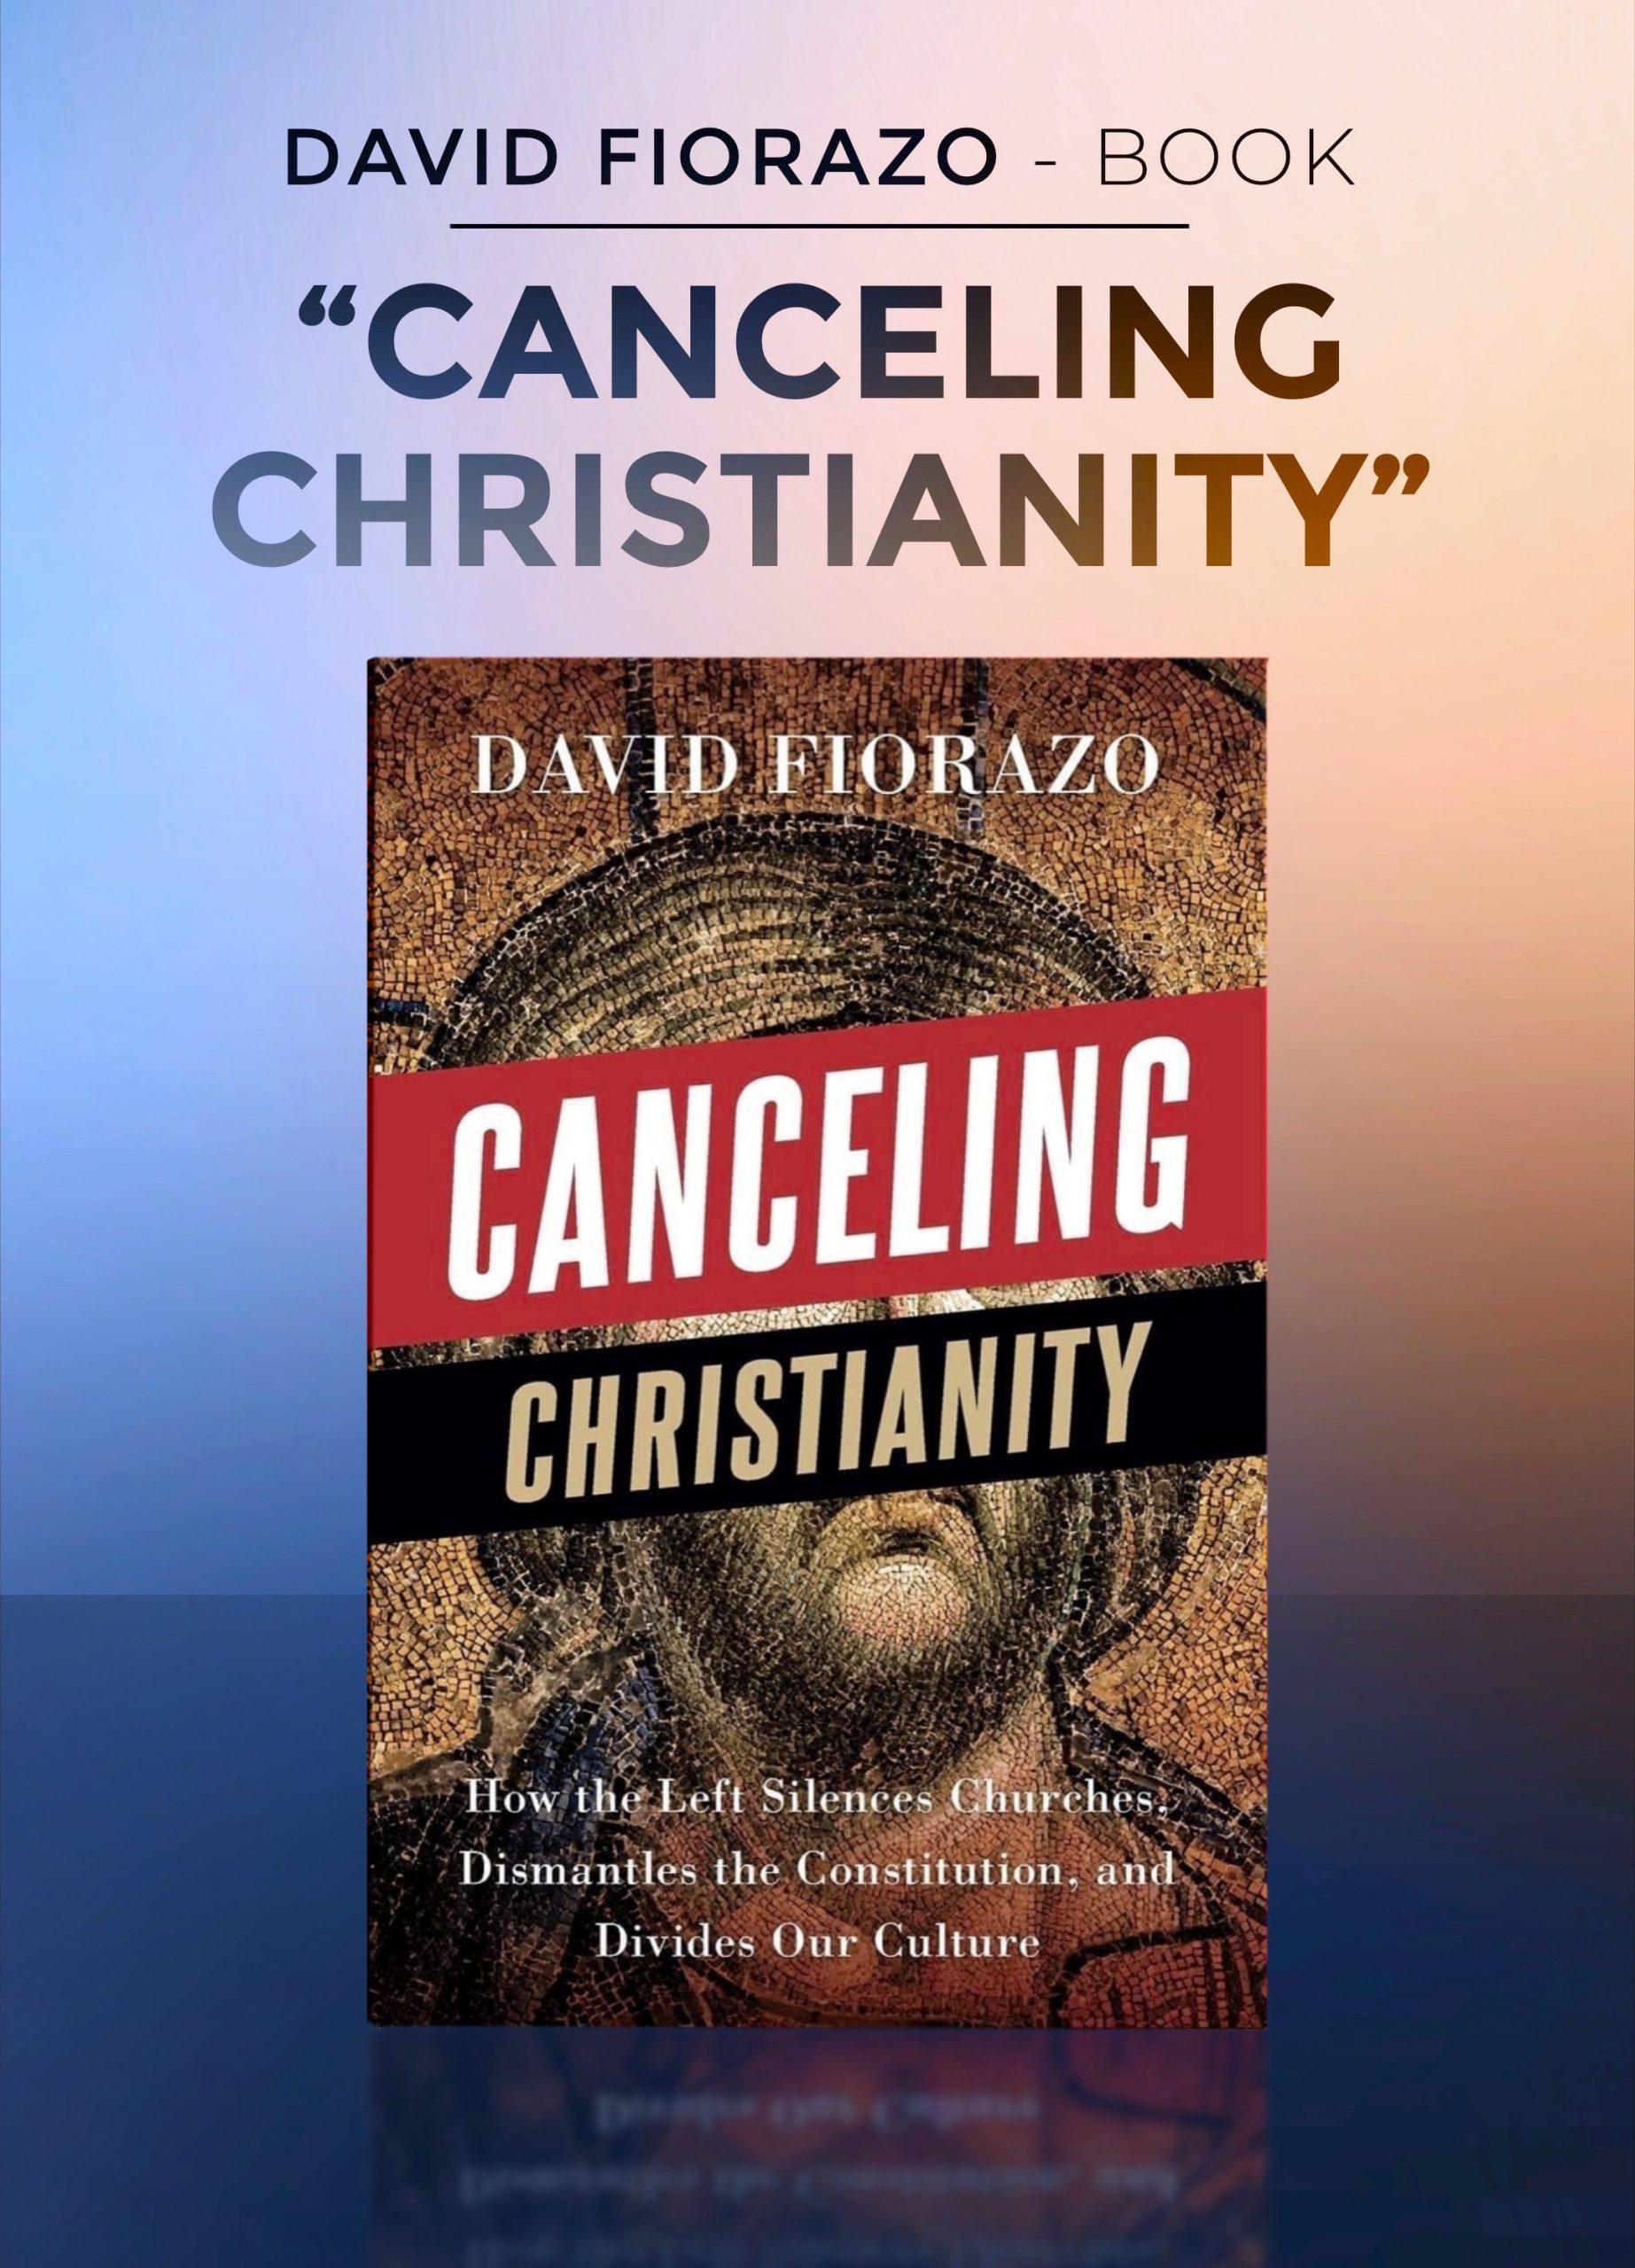 David Fiorazo - Canceling Christianity